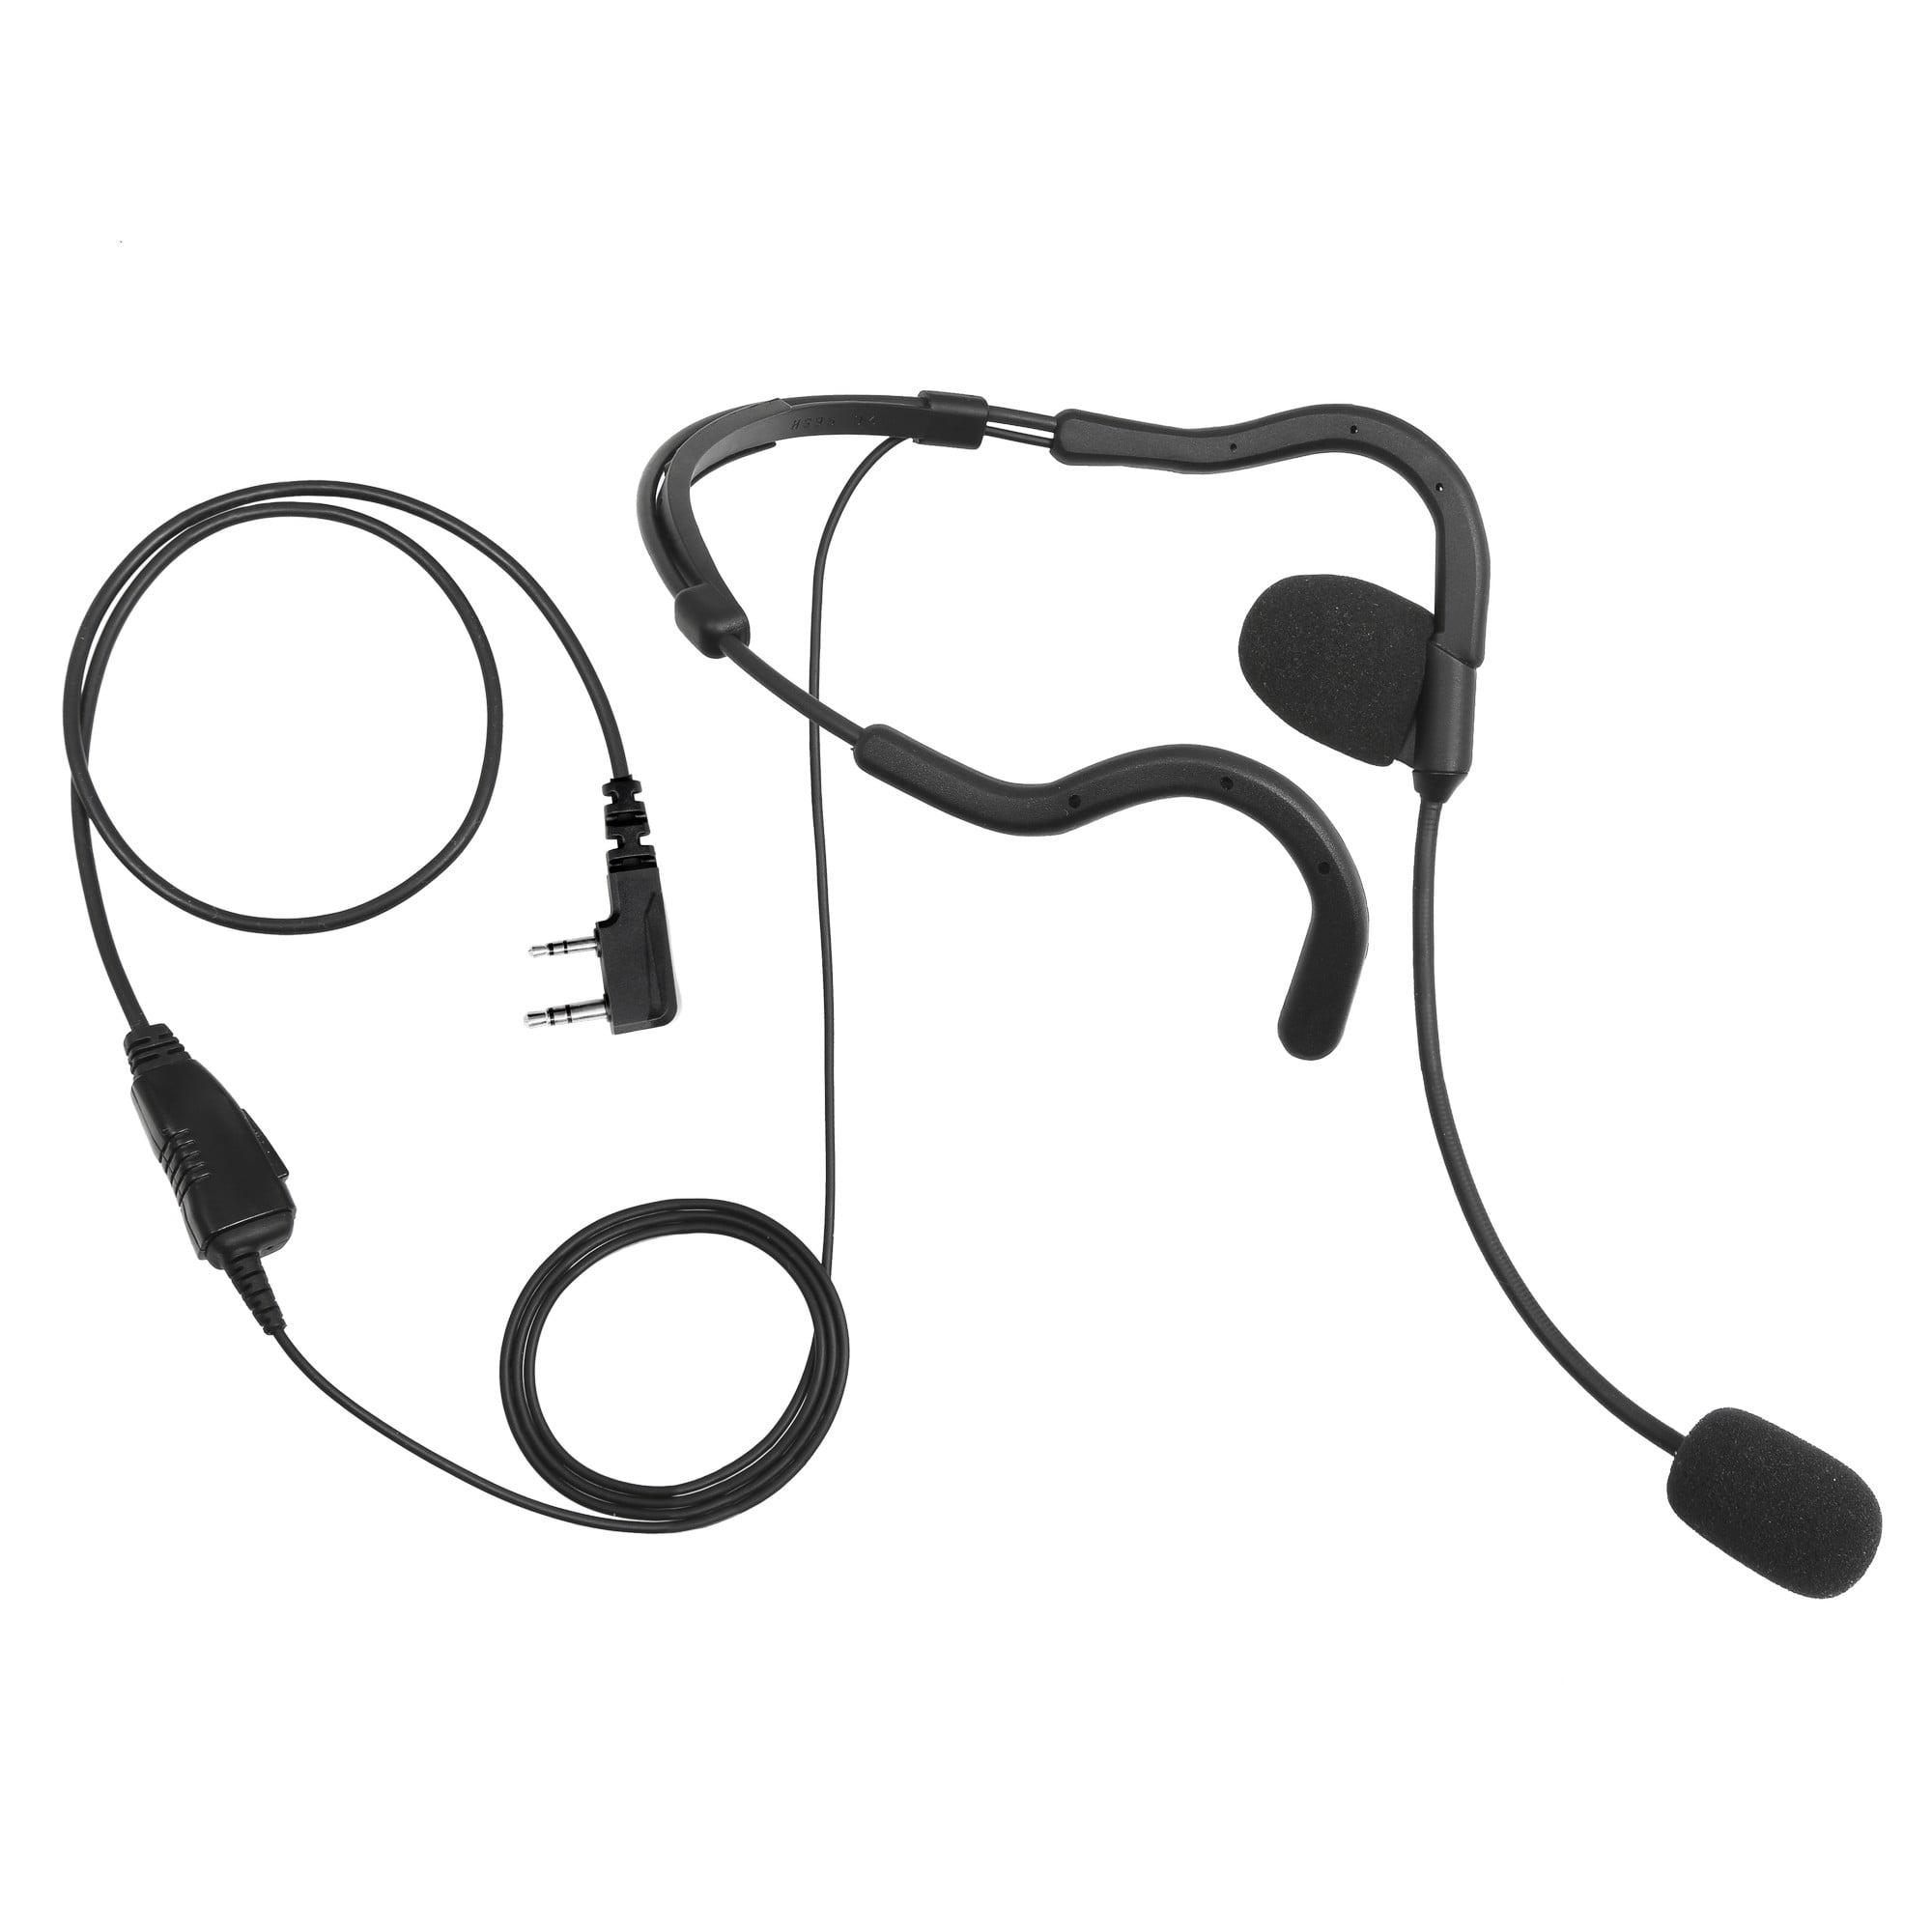 Audio Pro-grade 2-Way Radio Earpiece PTT for Wouxun KG-D900 KG-UVD1P KG-UVA1